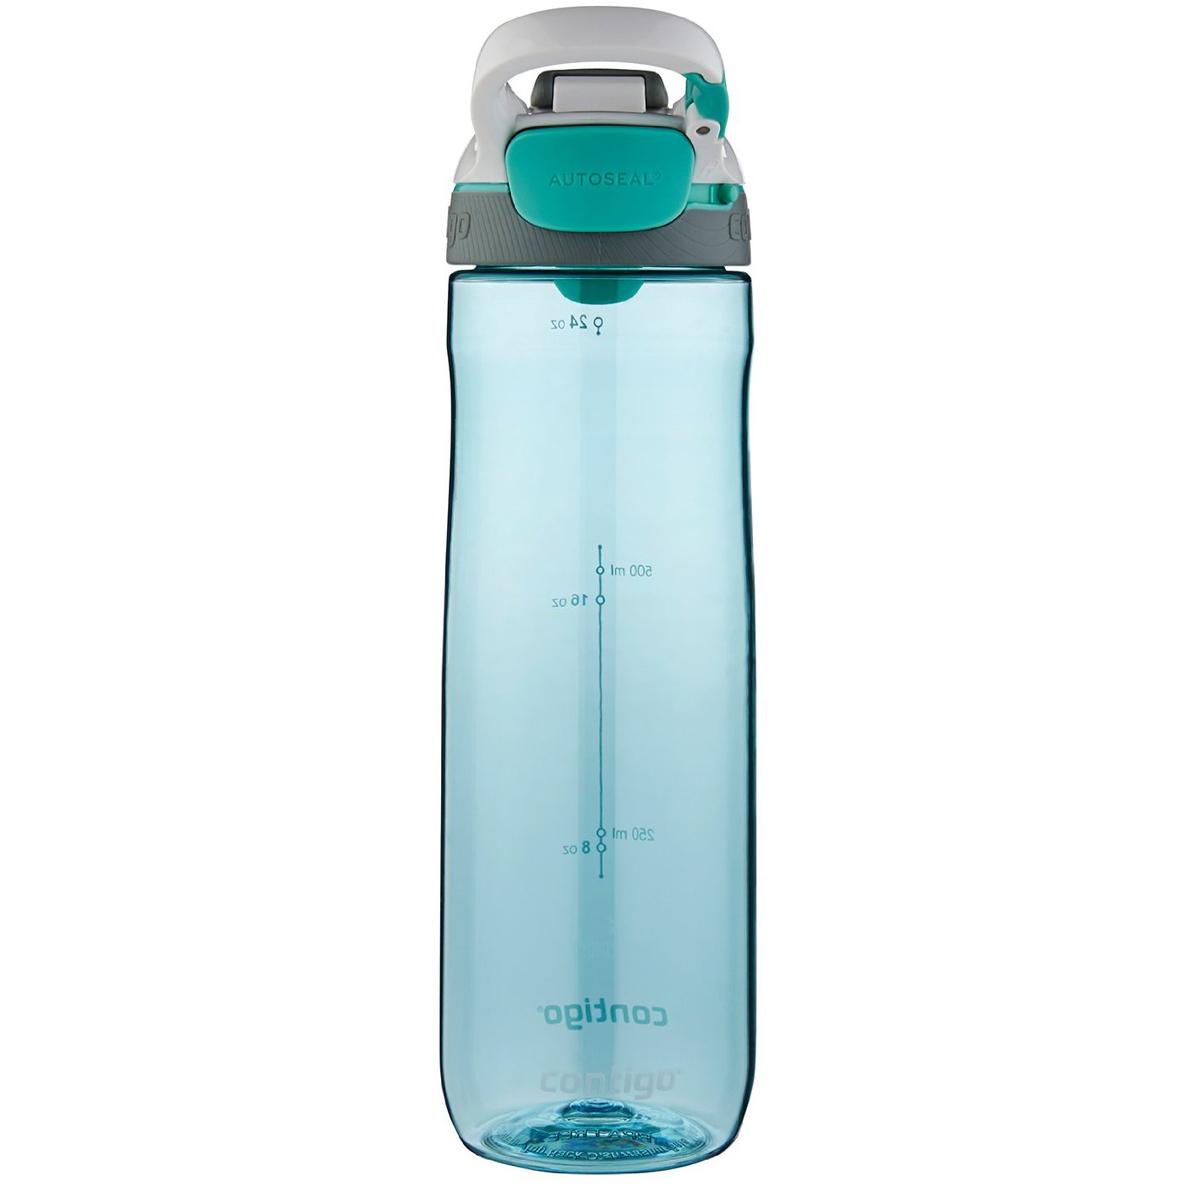 Contigo-24-oz-Cortland-Autoseal-Water-Bottle miniatuur 4